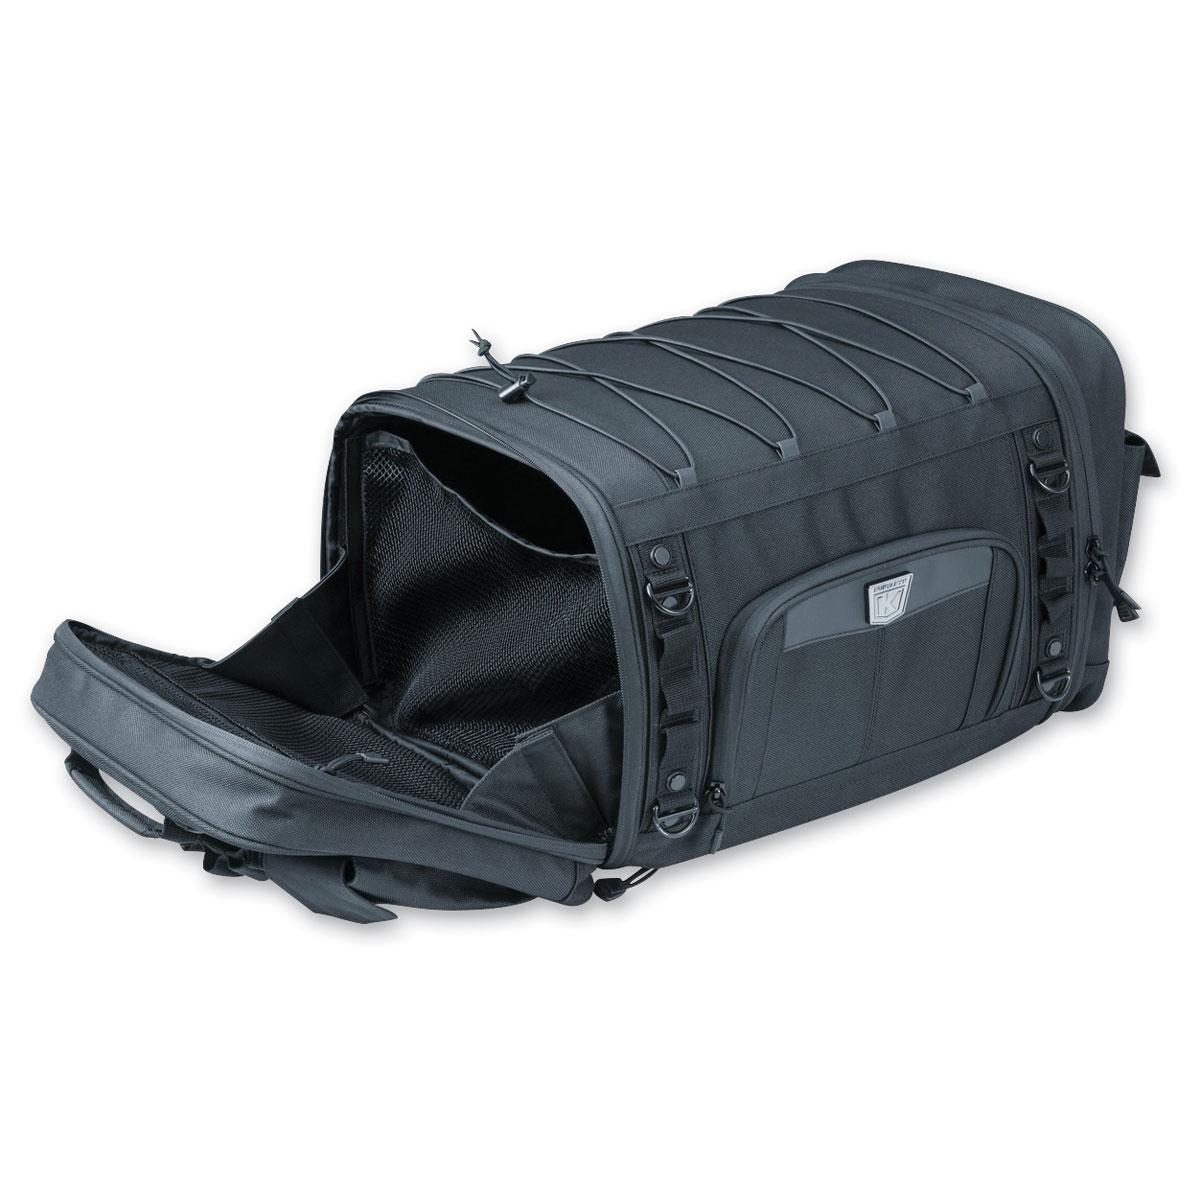 Kuryakyn Momentum Road Warrior Bag Luggage Black Harley Indian Honda BMW Suzuki